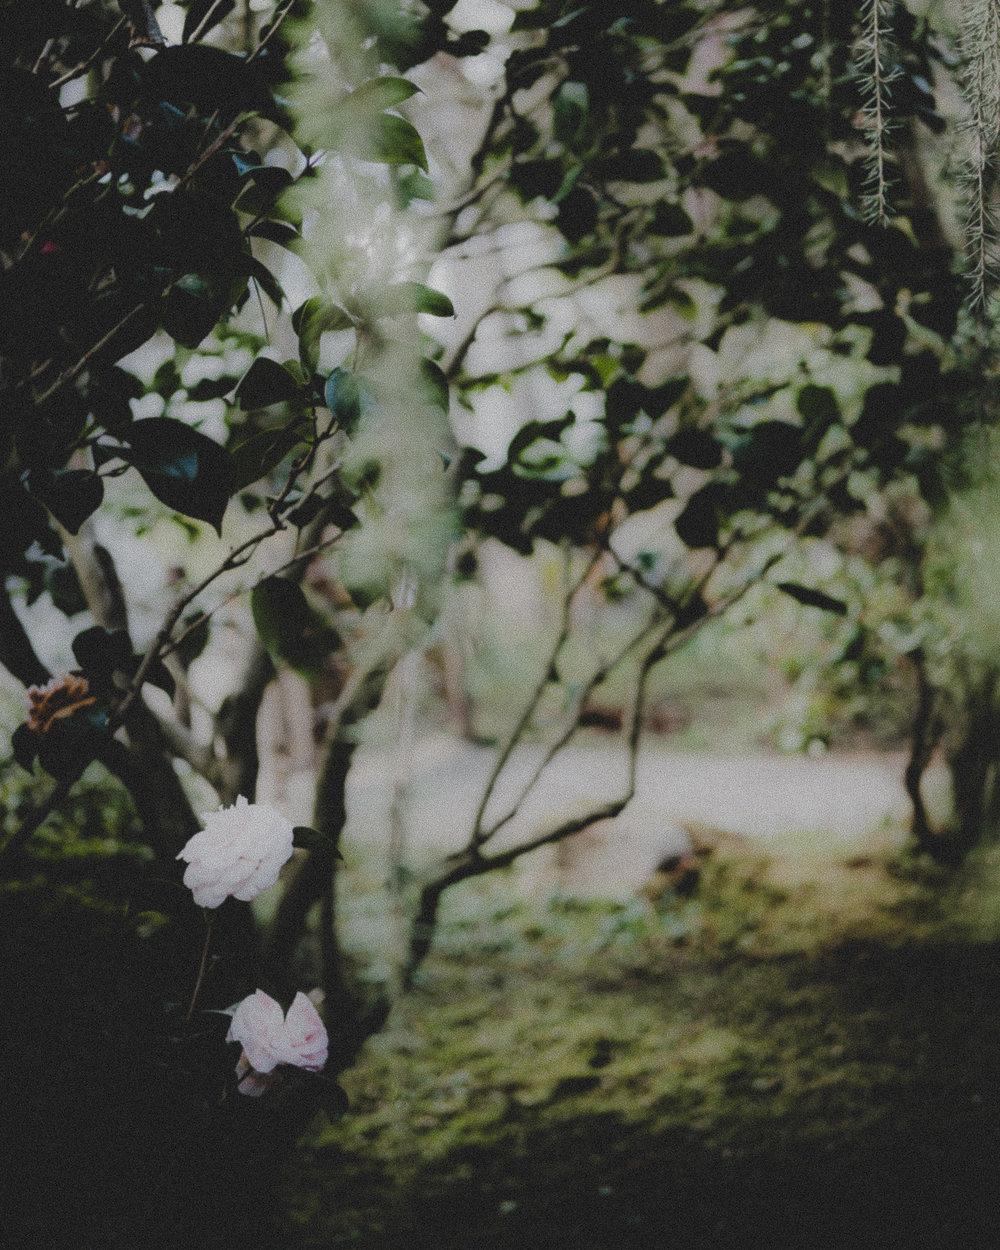 WA-Jardin-5295.jpg